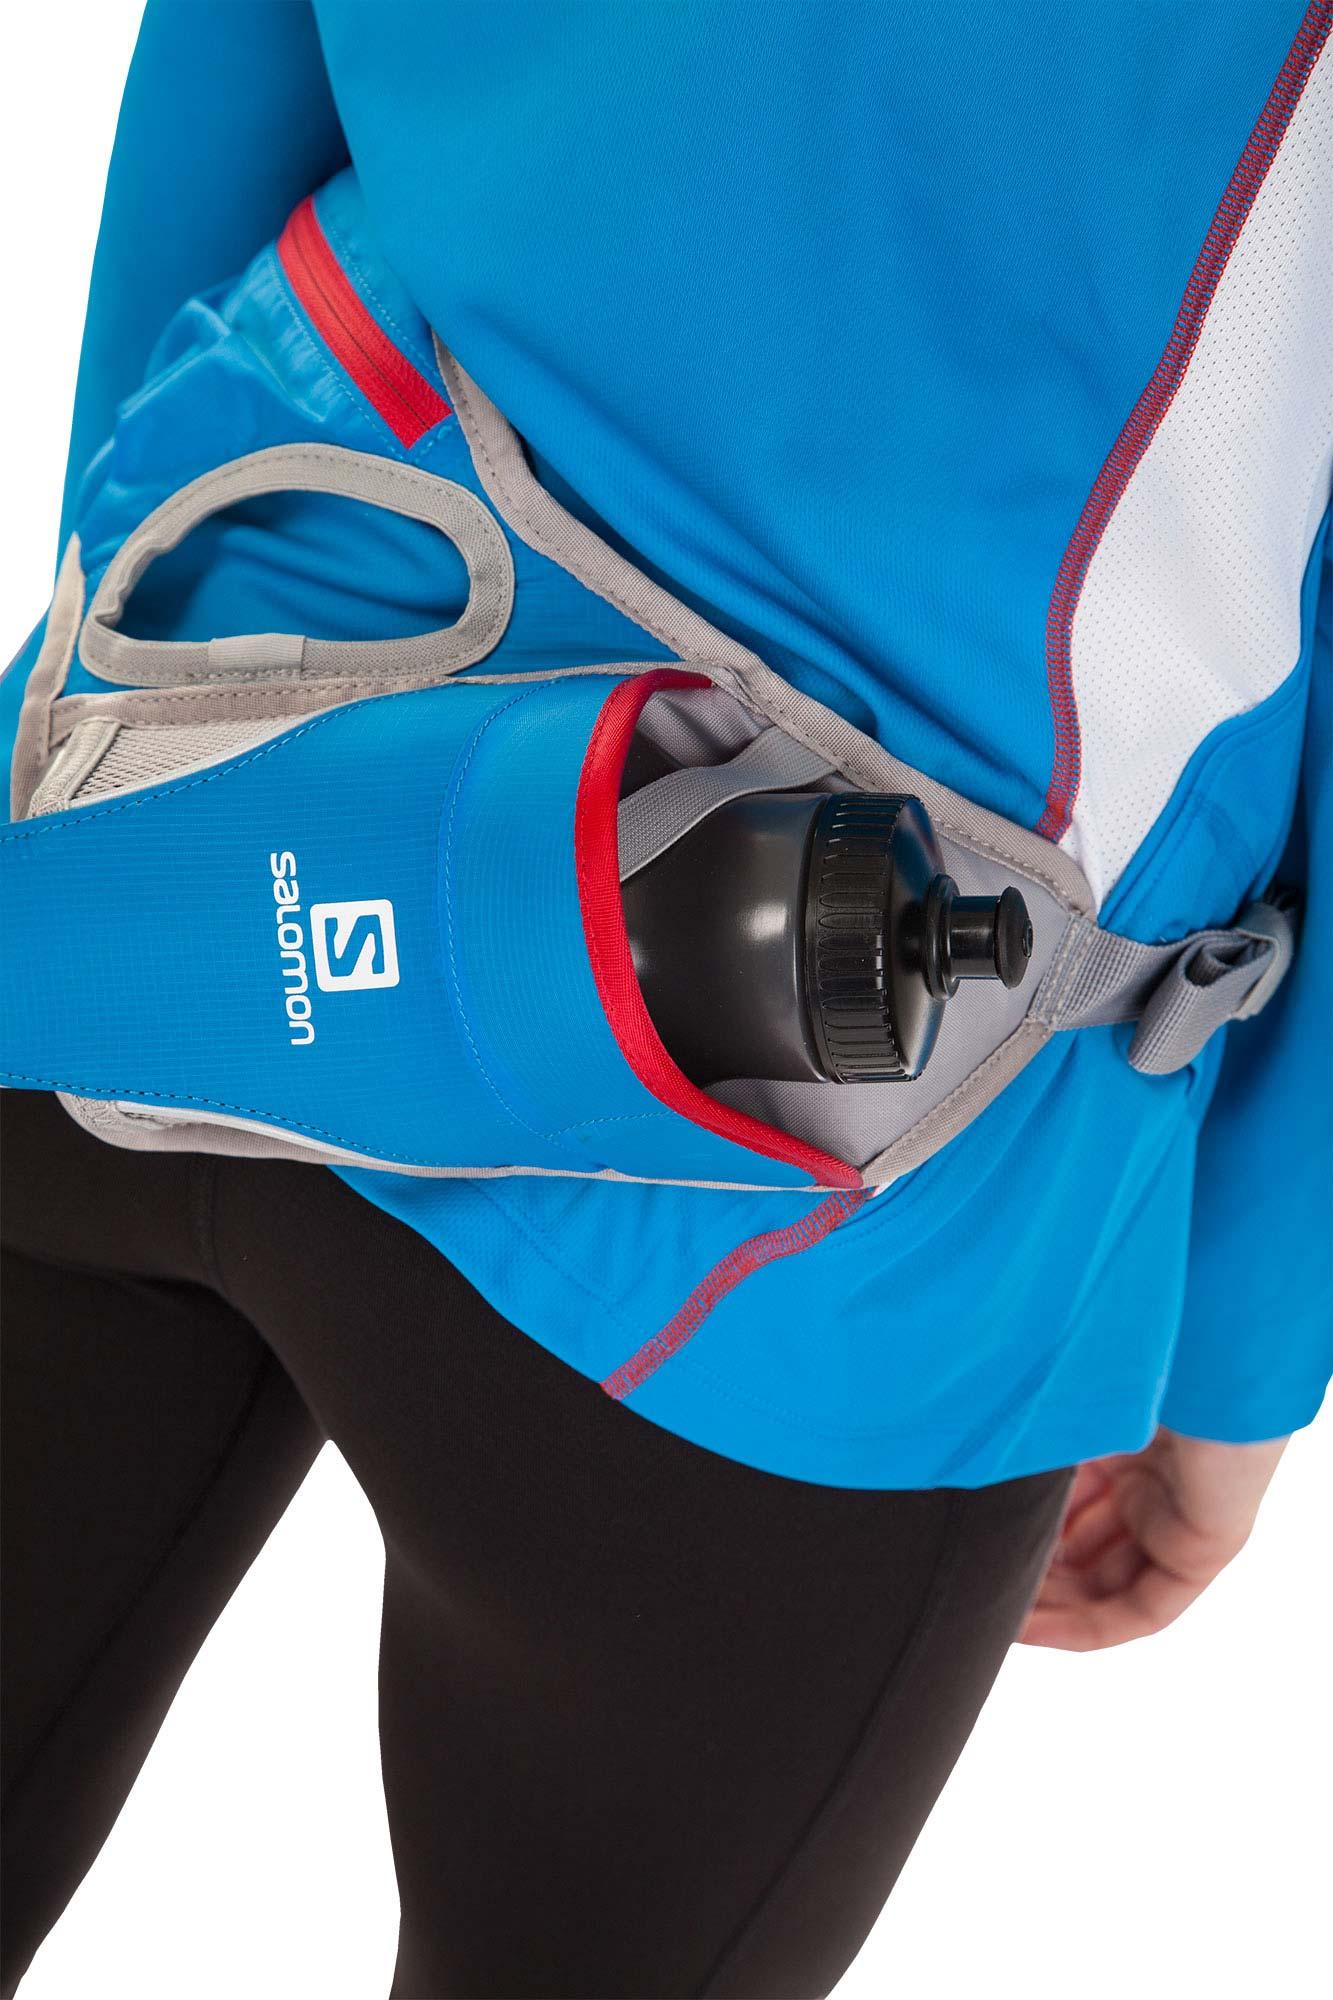 9931688d08ca HYDRO 45 BELT BL LOTUS PINK - Bottle belt for running